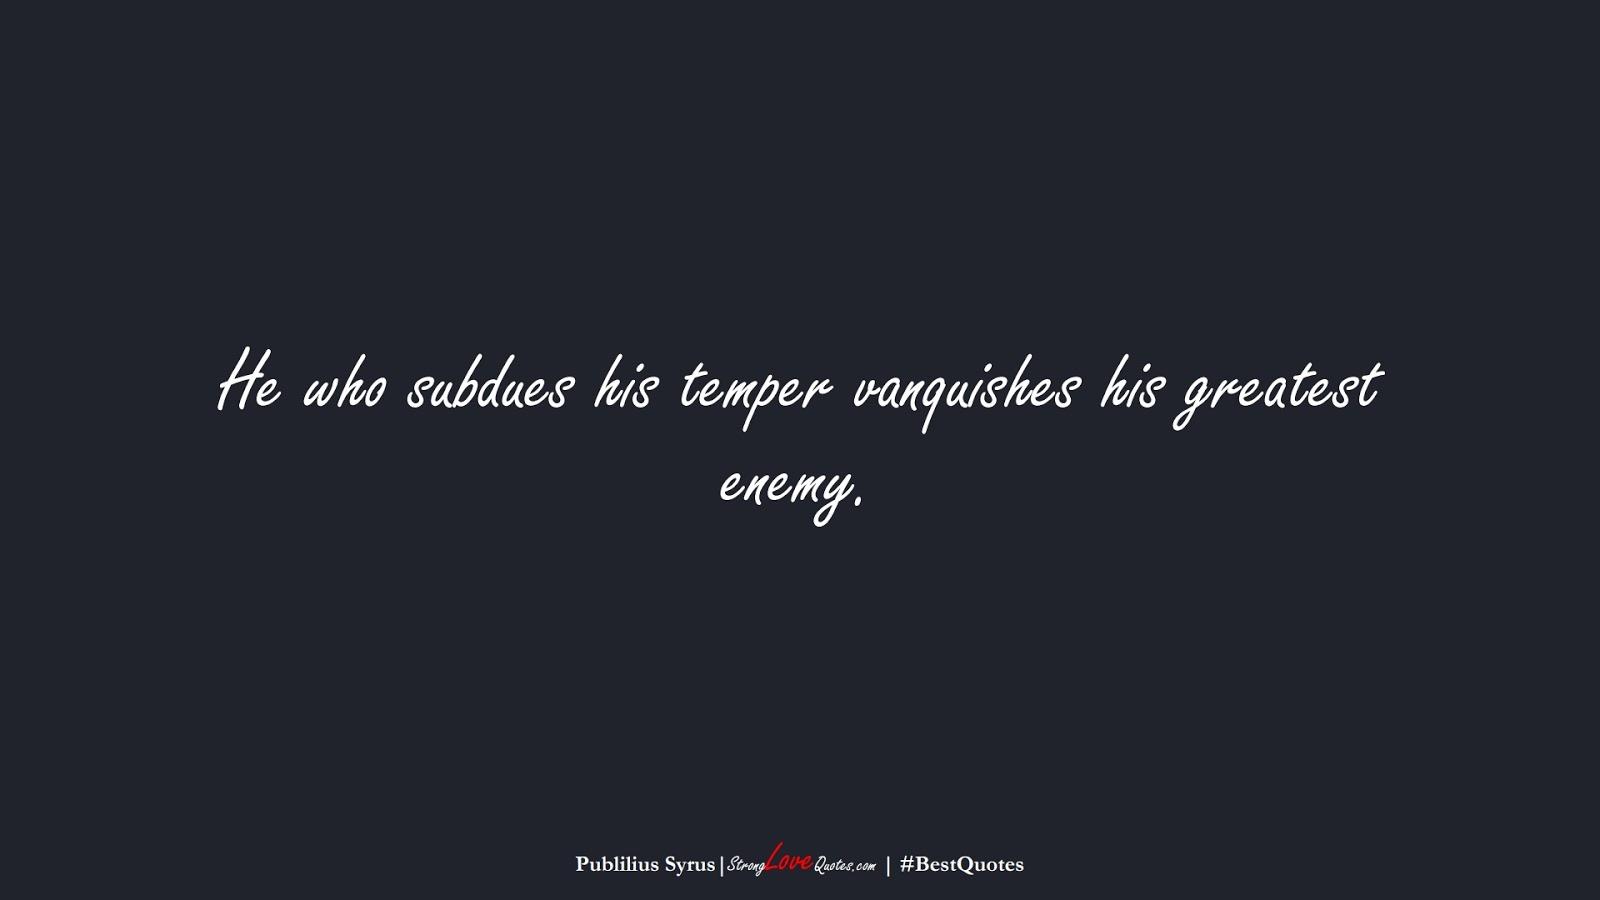 He who subdues his temper vanquishes his greatest enemy. (Publilius Syrus);  #BestQuotes